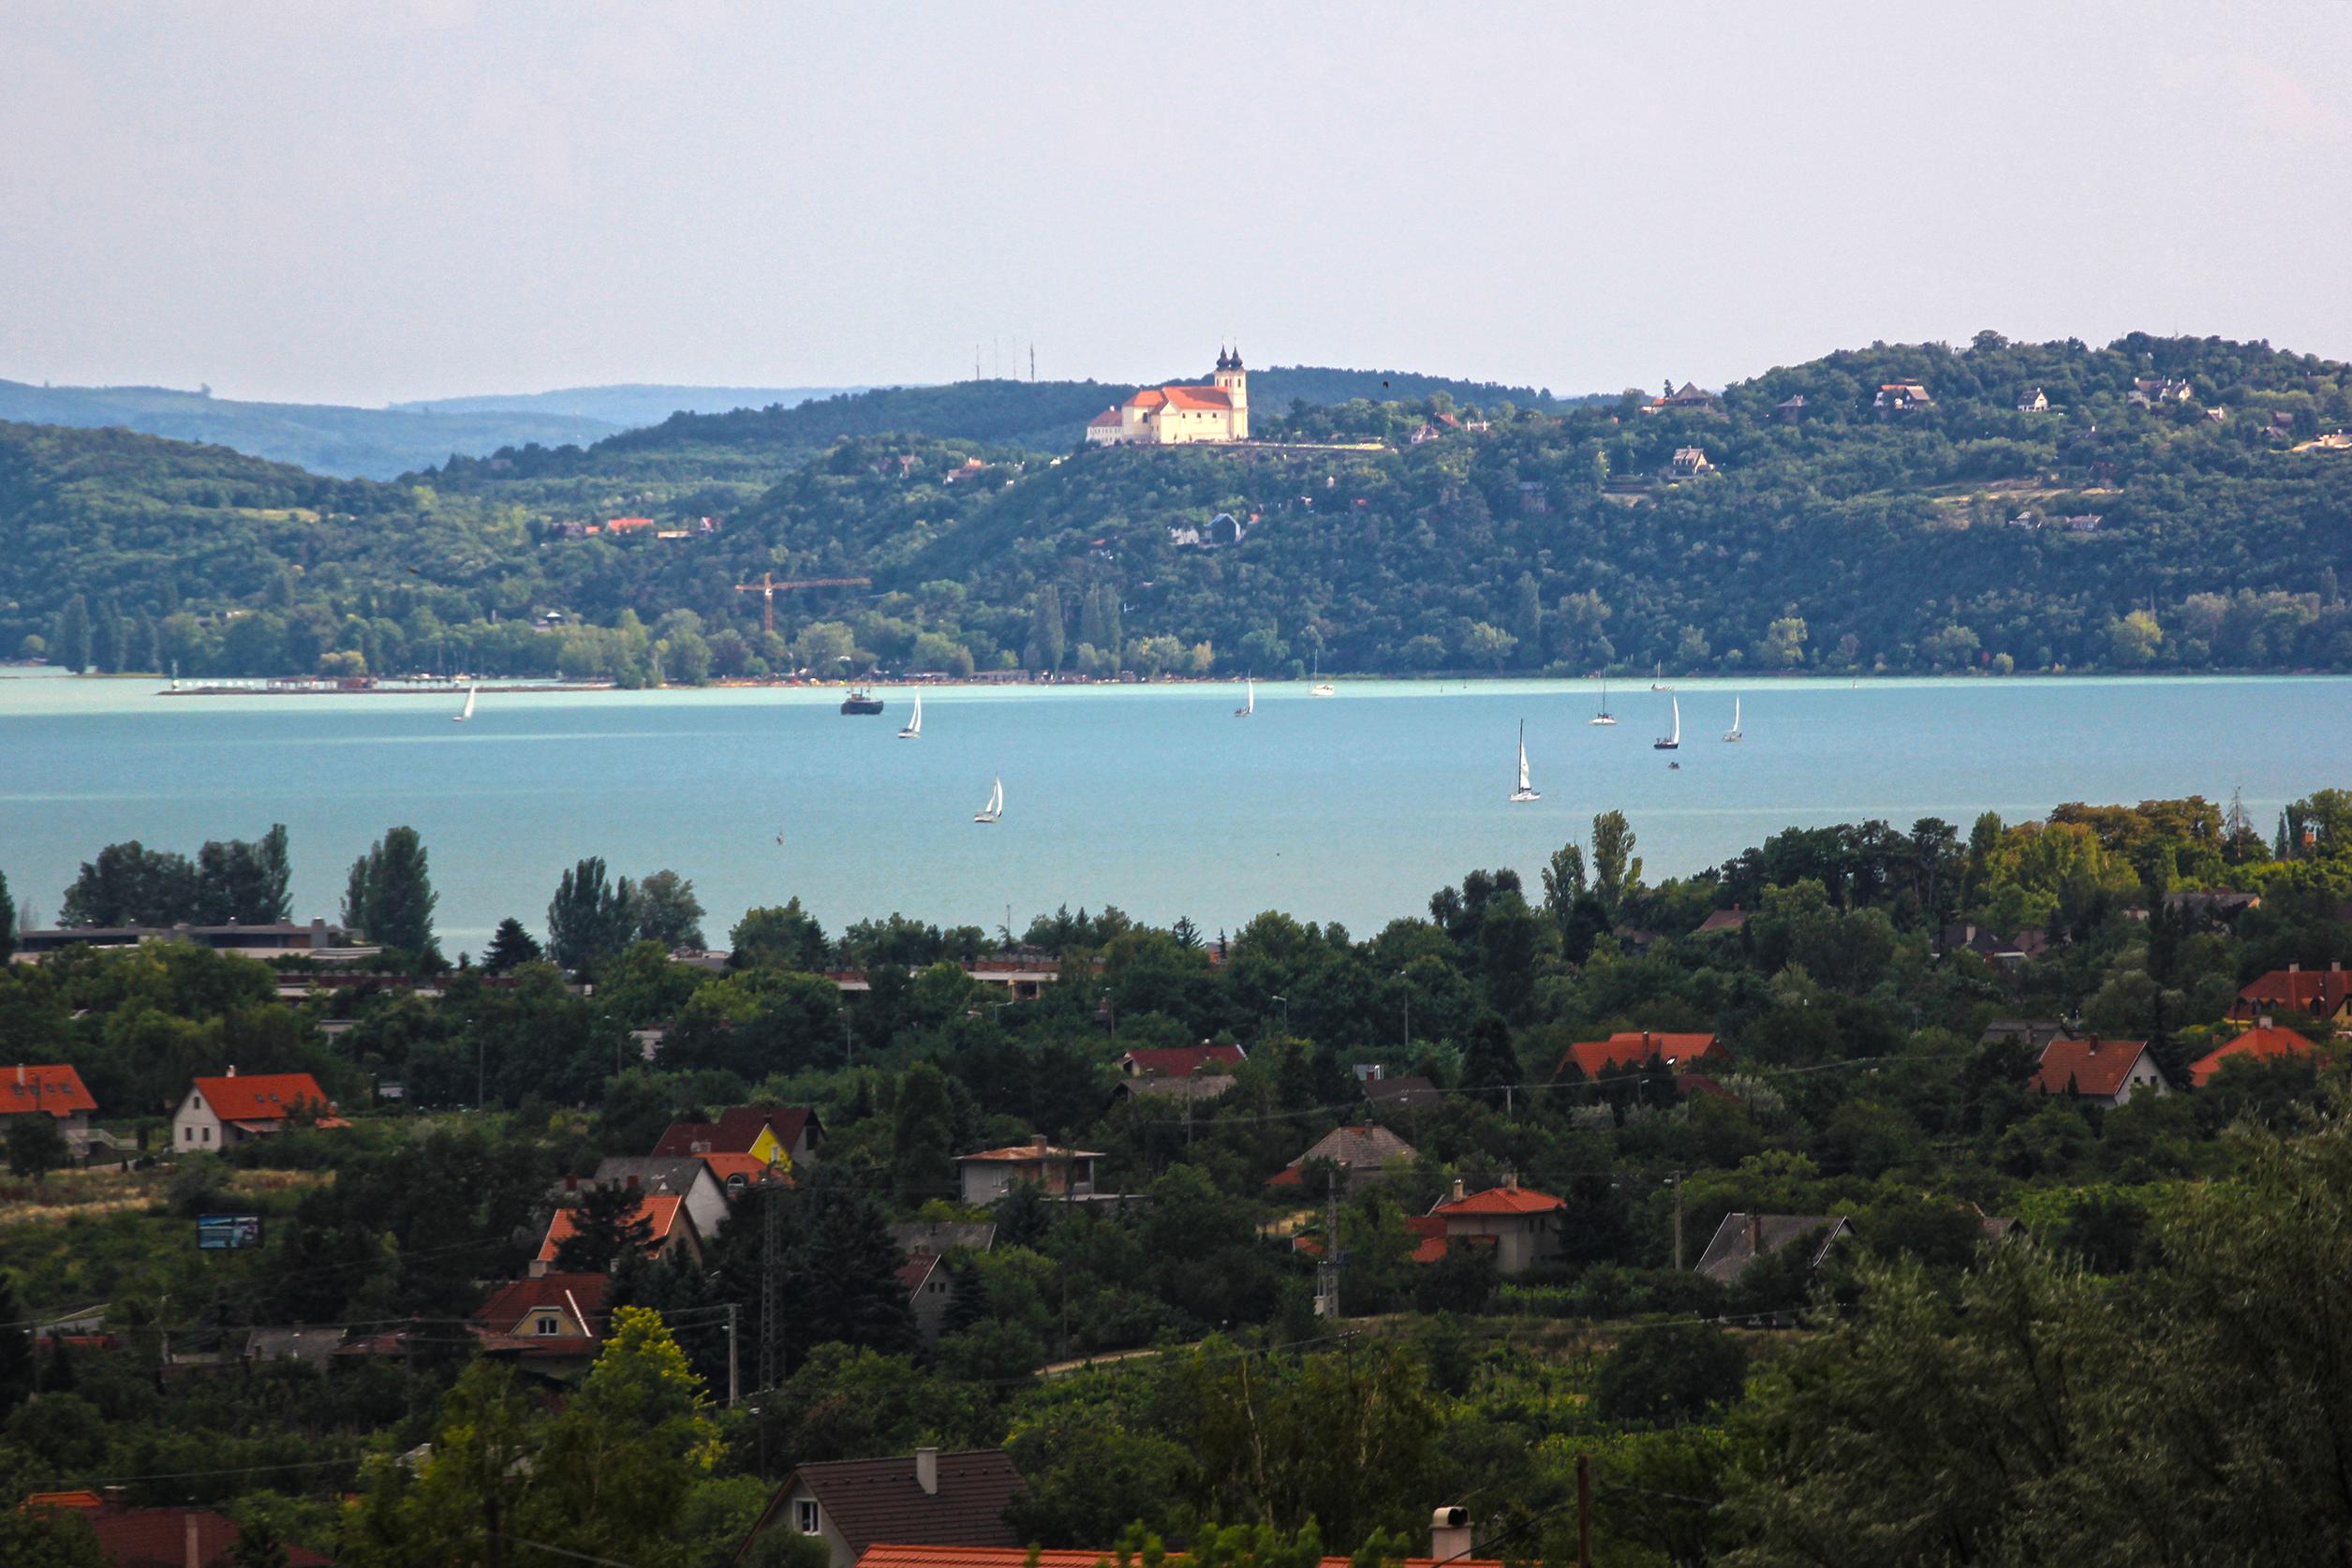 Tihany, Balatonfüred, Csopak viharfelhő, fotó © HAJOZAS.HU